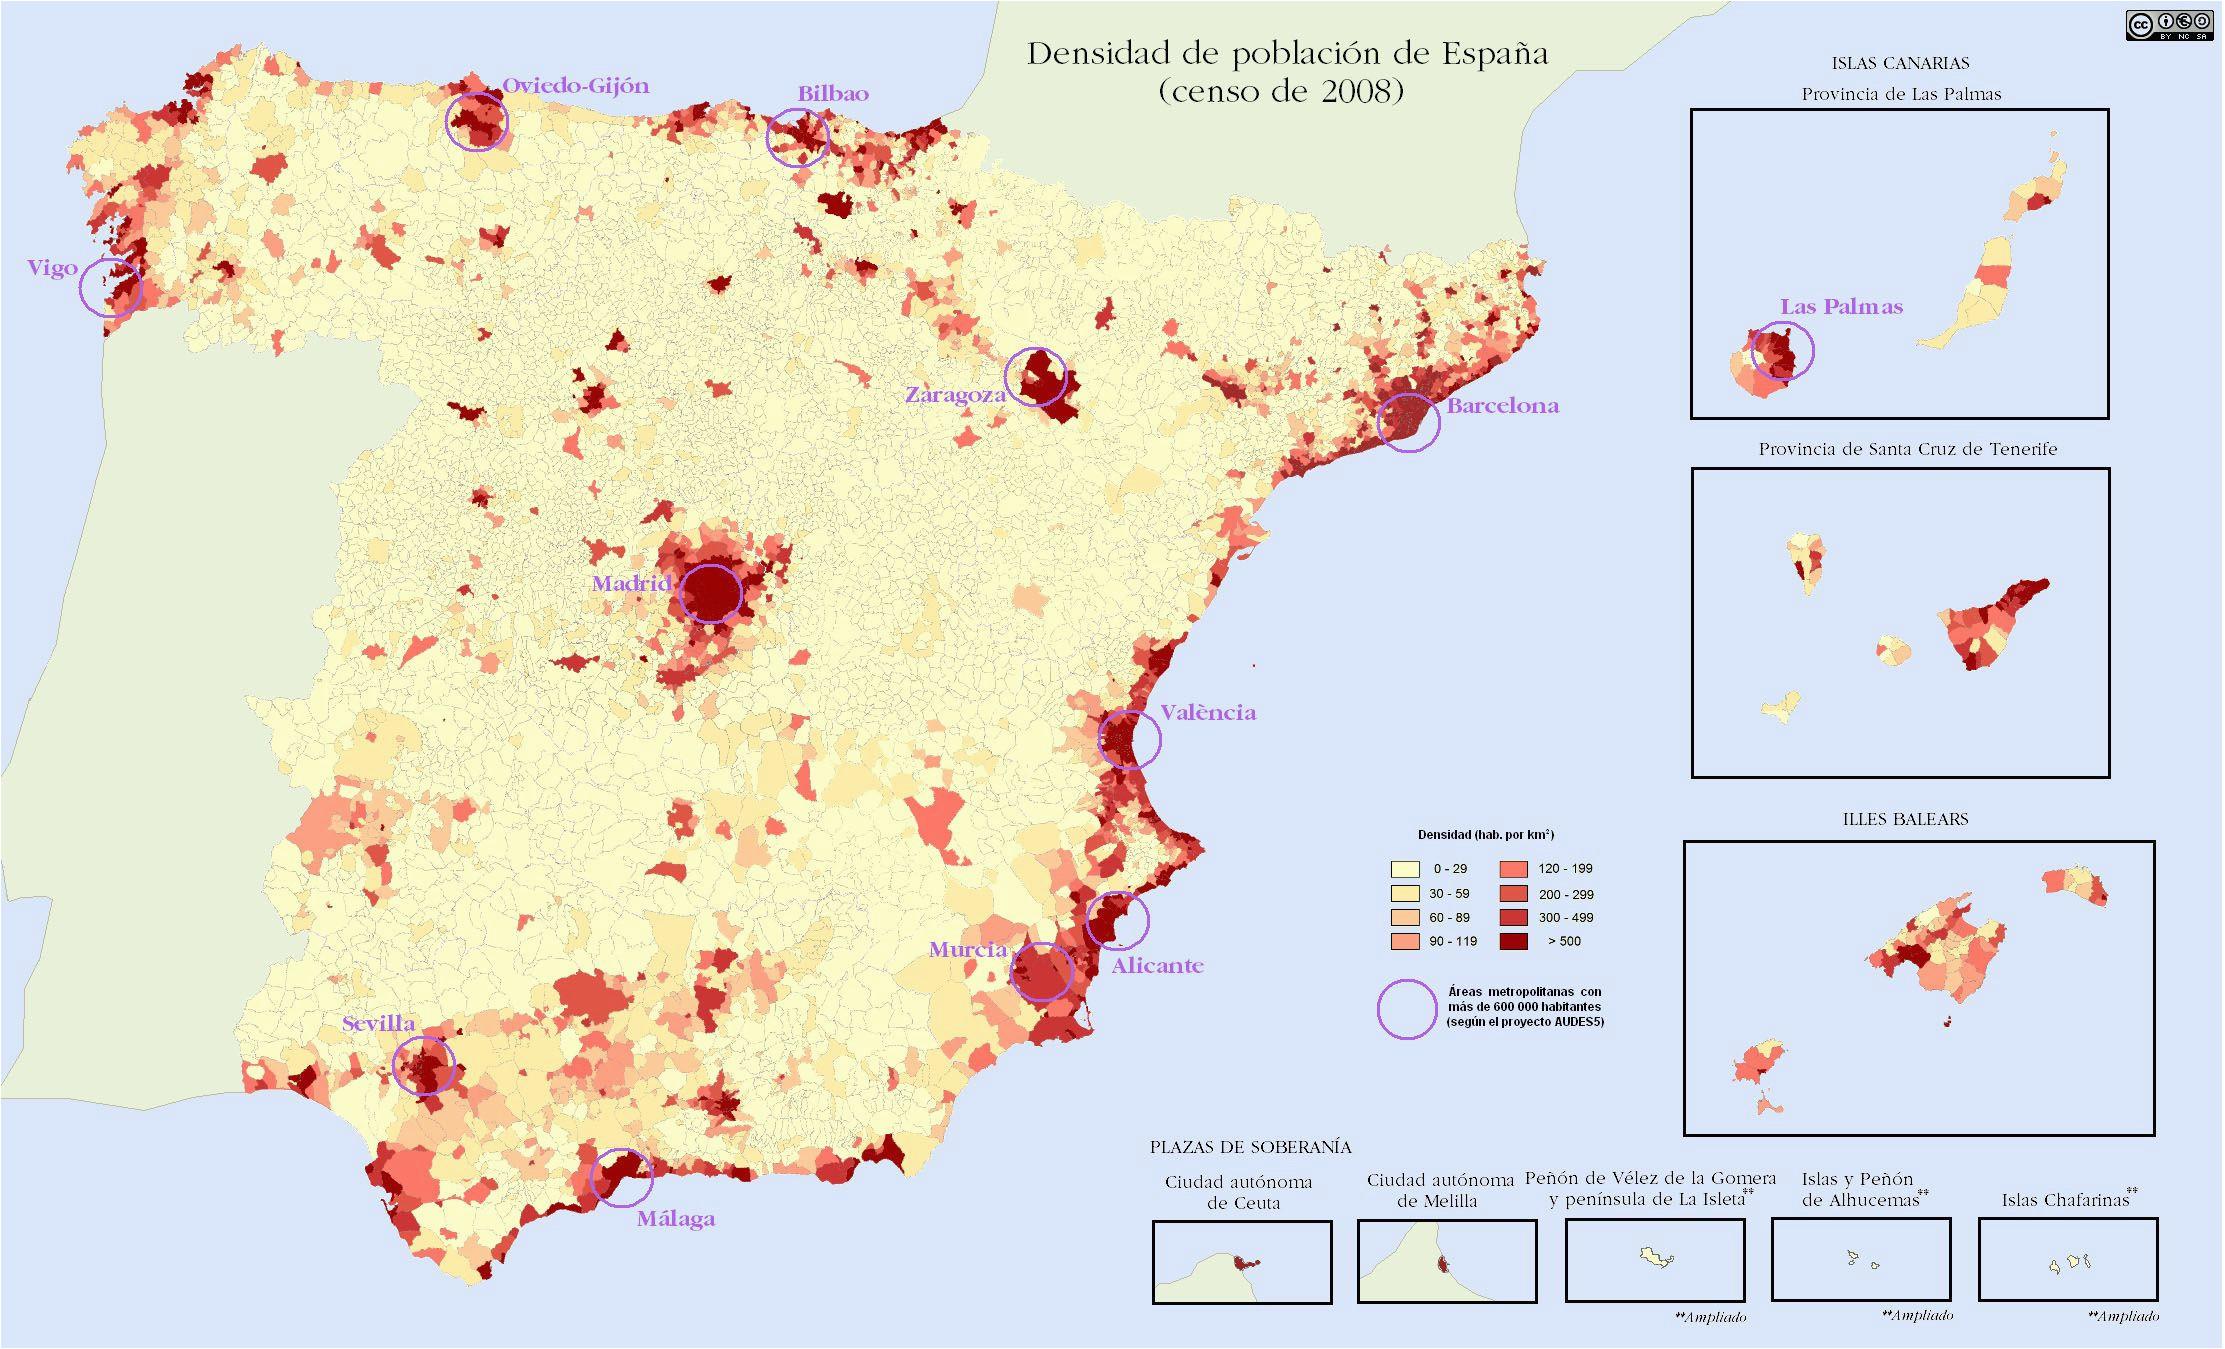 quantitative population density map of spain lighter colors